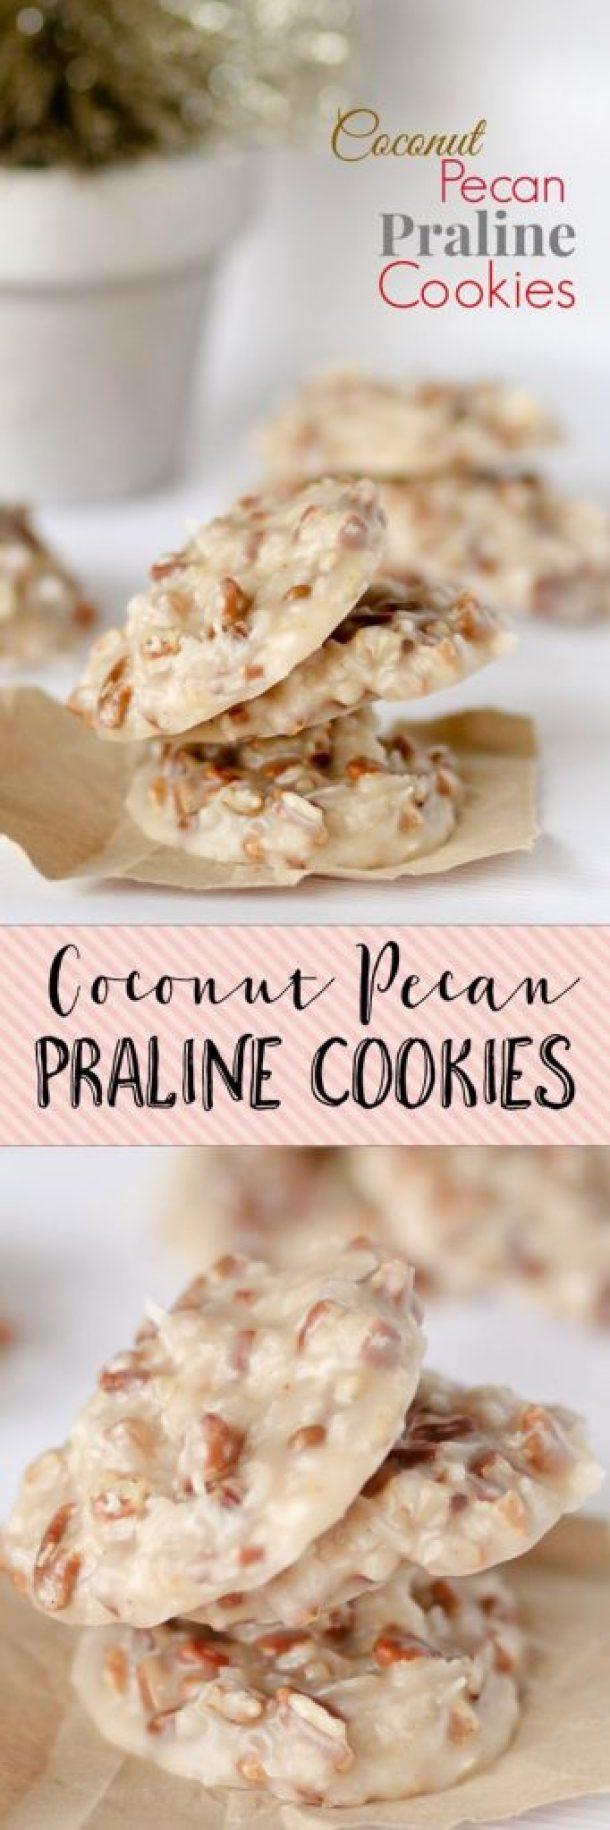 No Bake Cookies Recipes - No Bake Coconut Pecan Praline Cookies Recipe via Confessions of a Cookbook Queen